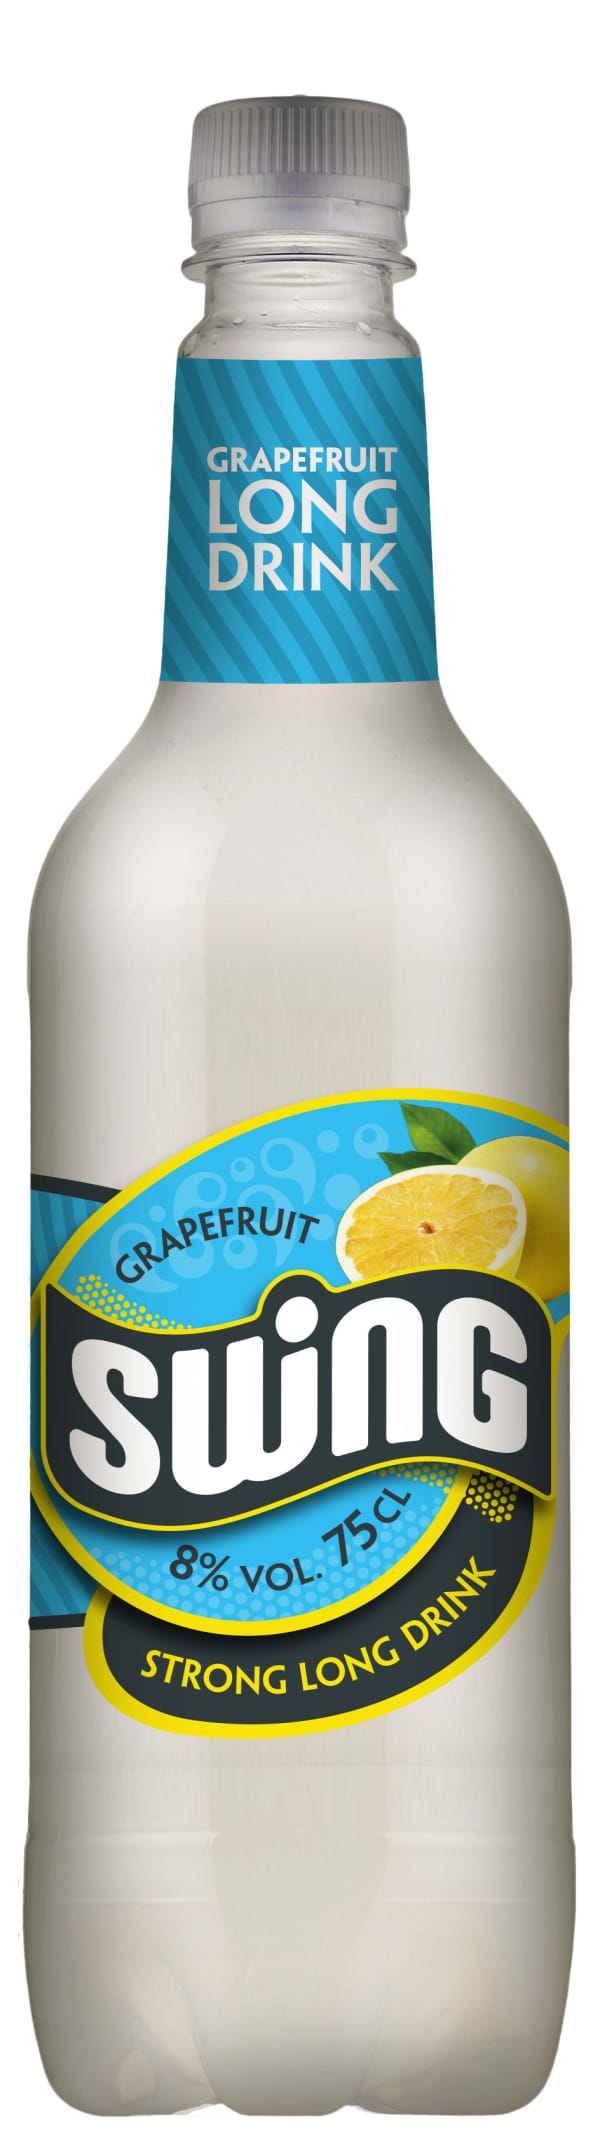 Swing Grapefruit Strong Long Drink  muovipullo